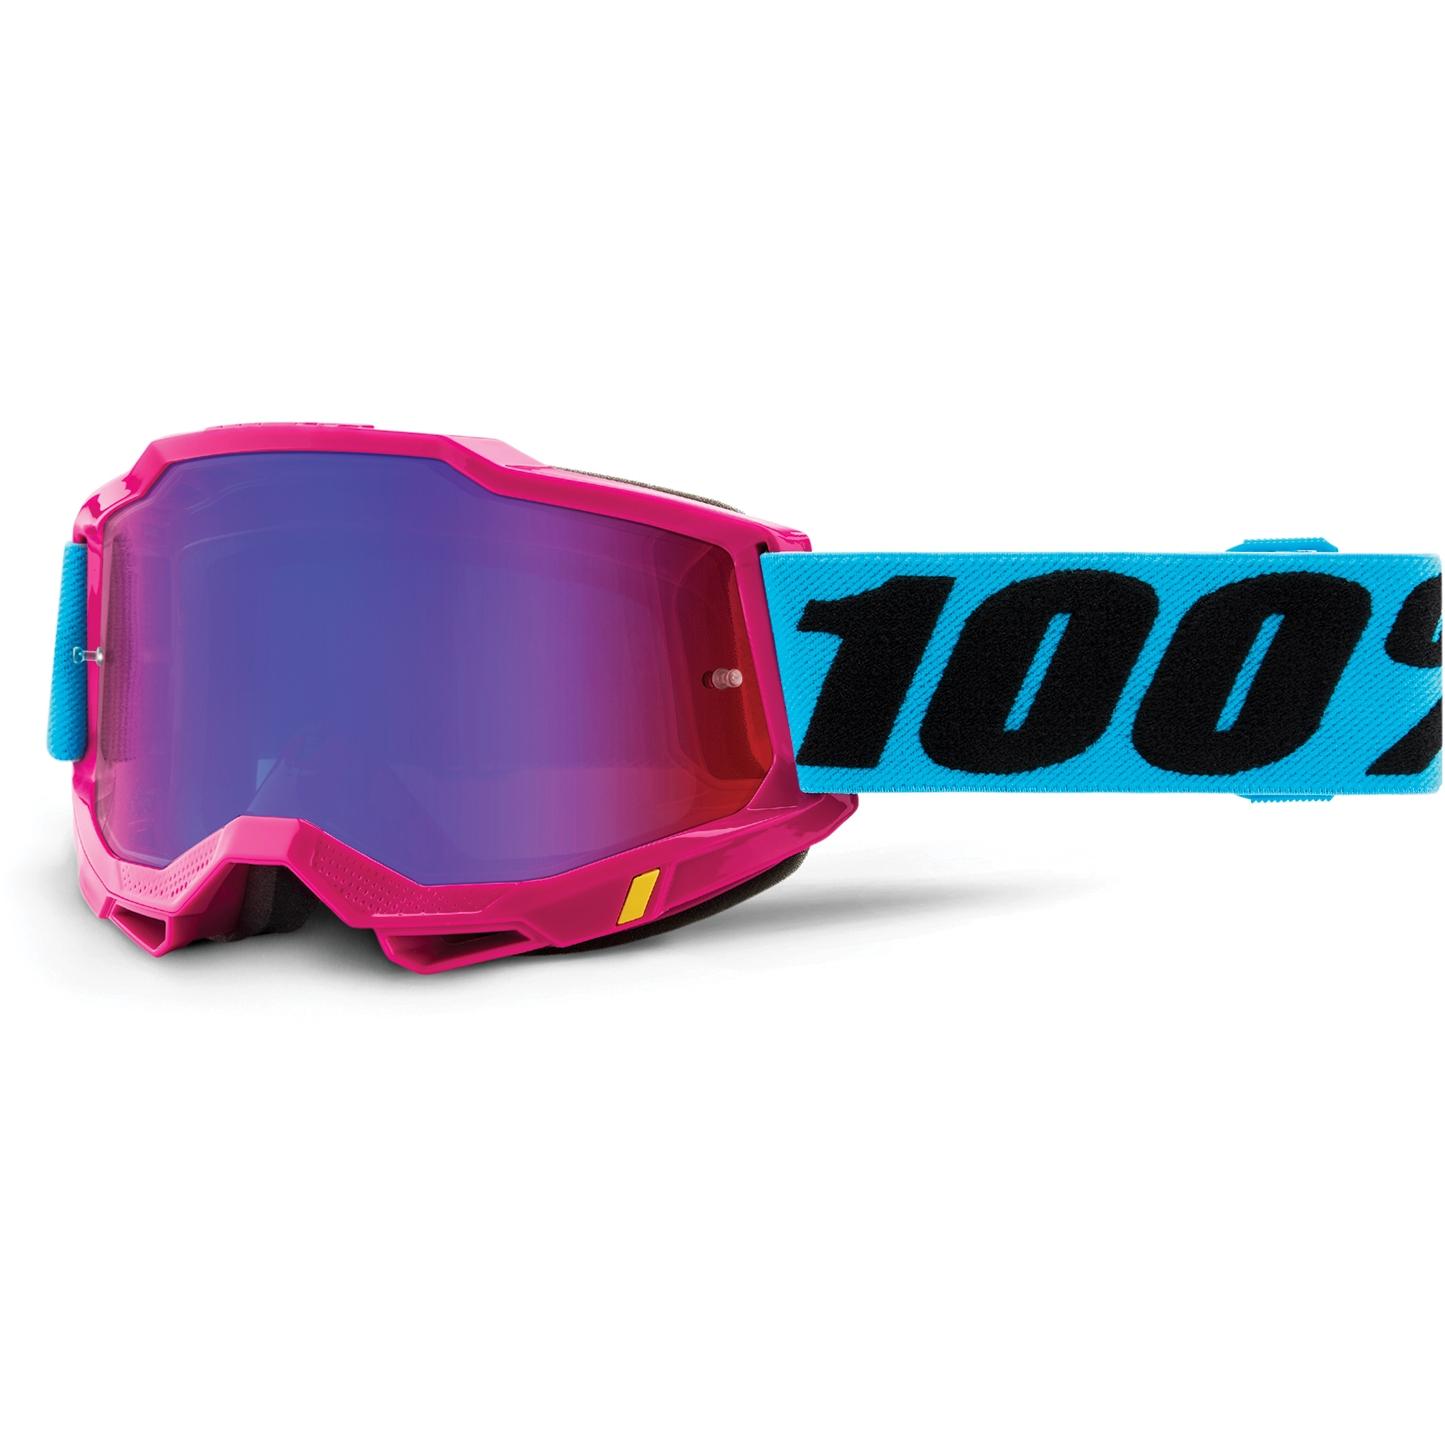 100% Accuri 2 Goggle Mirror Lens Gafas - Lefleur